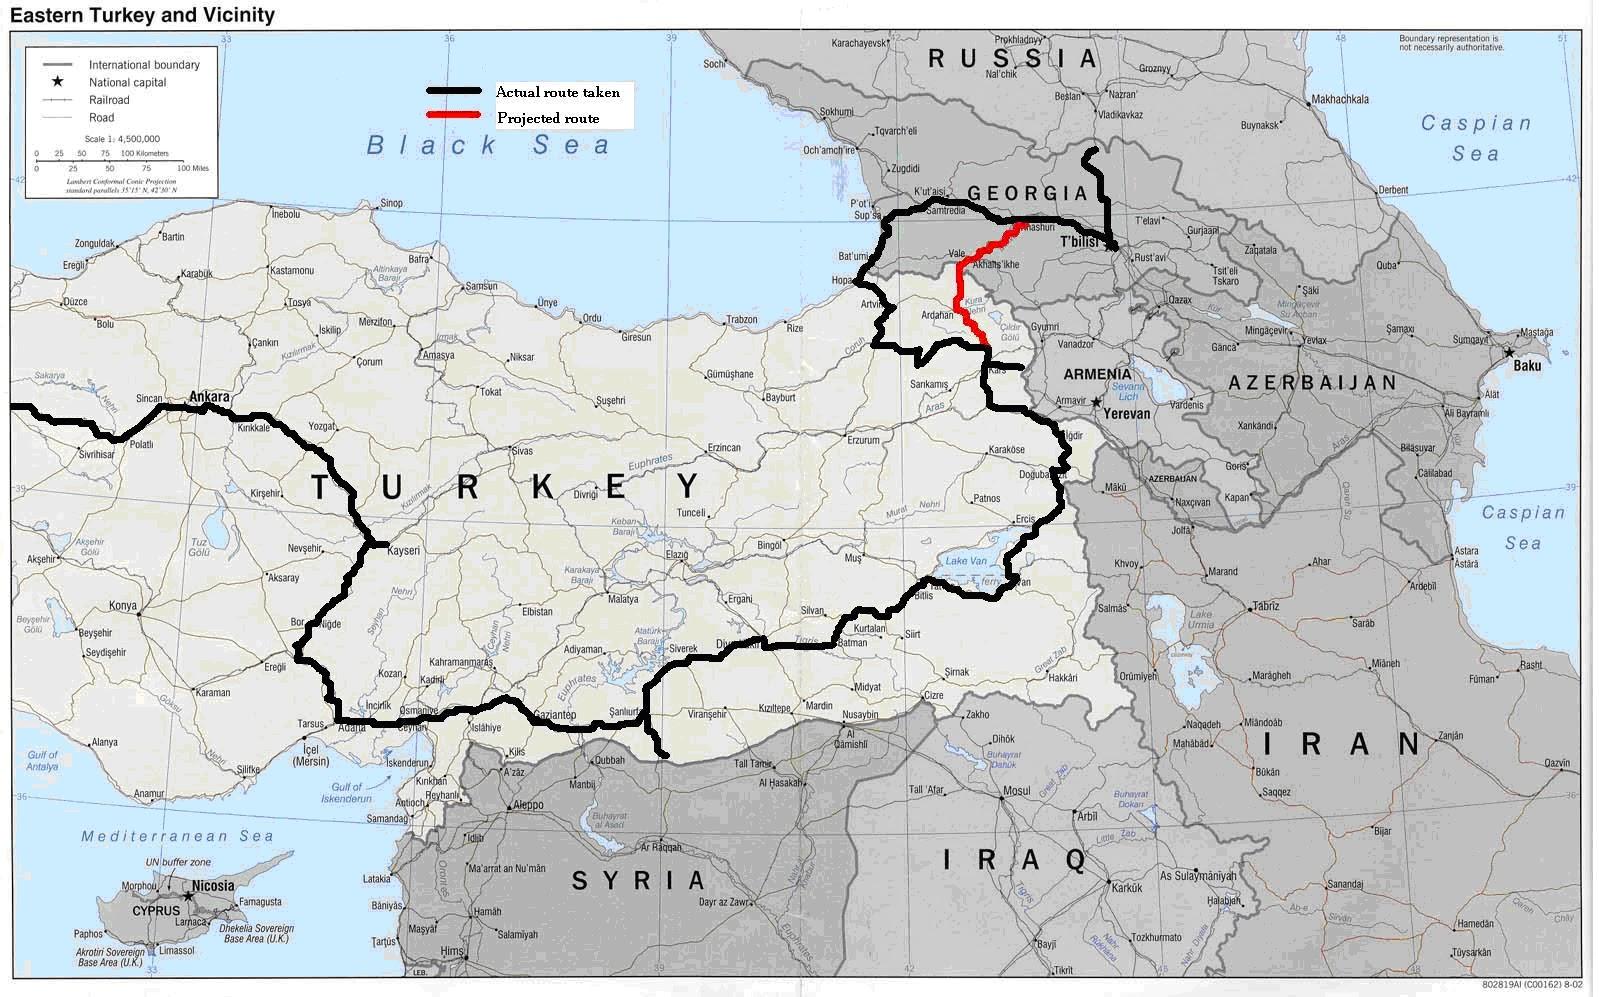 Uncle Travelling Matt Latvia Georgia And Turkey Pt Tbilisi - Georgia kazbegi map